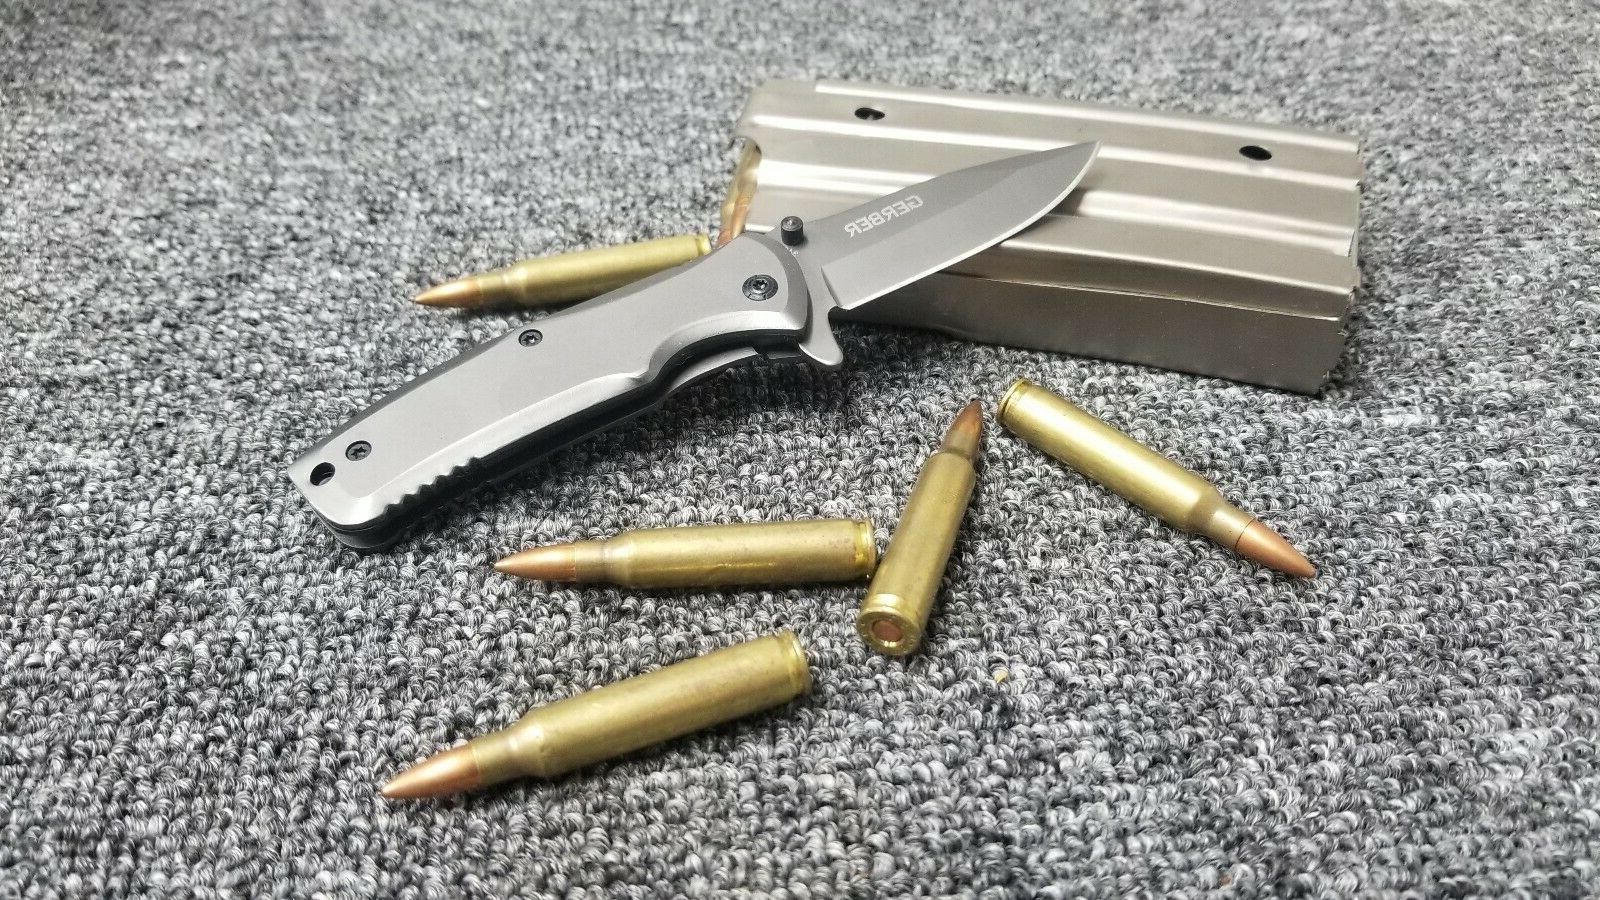 gray spring assisted covert folding pocket knife